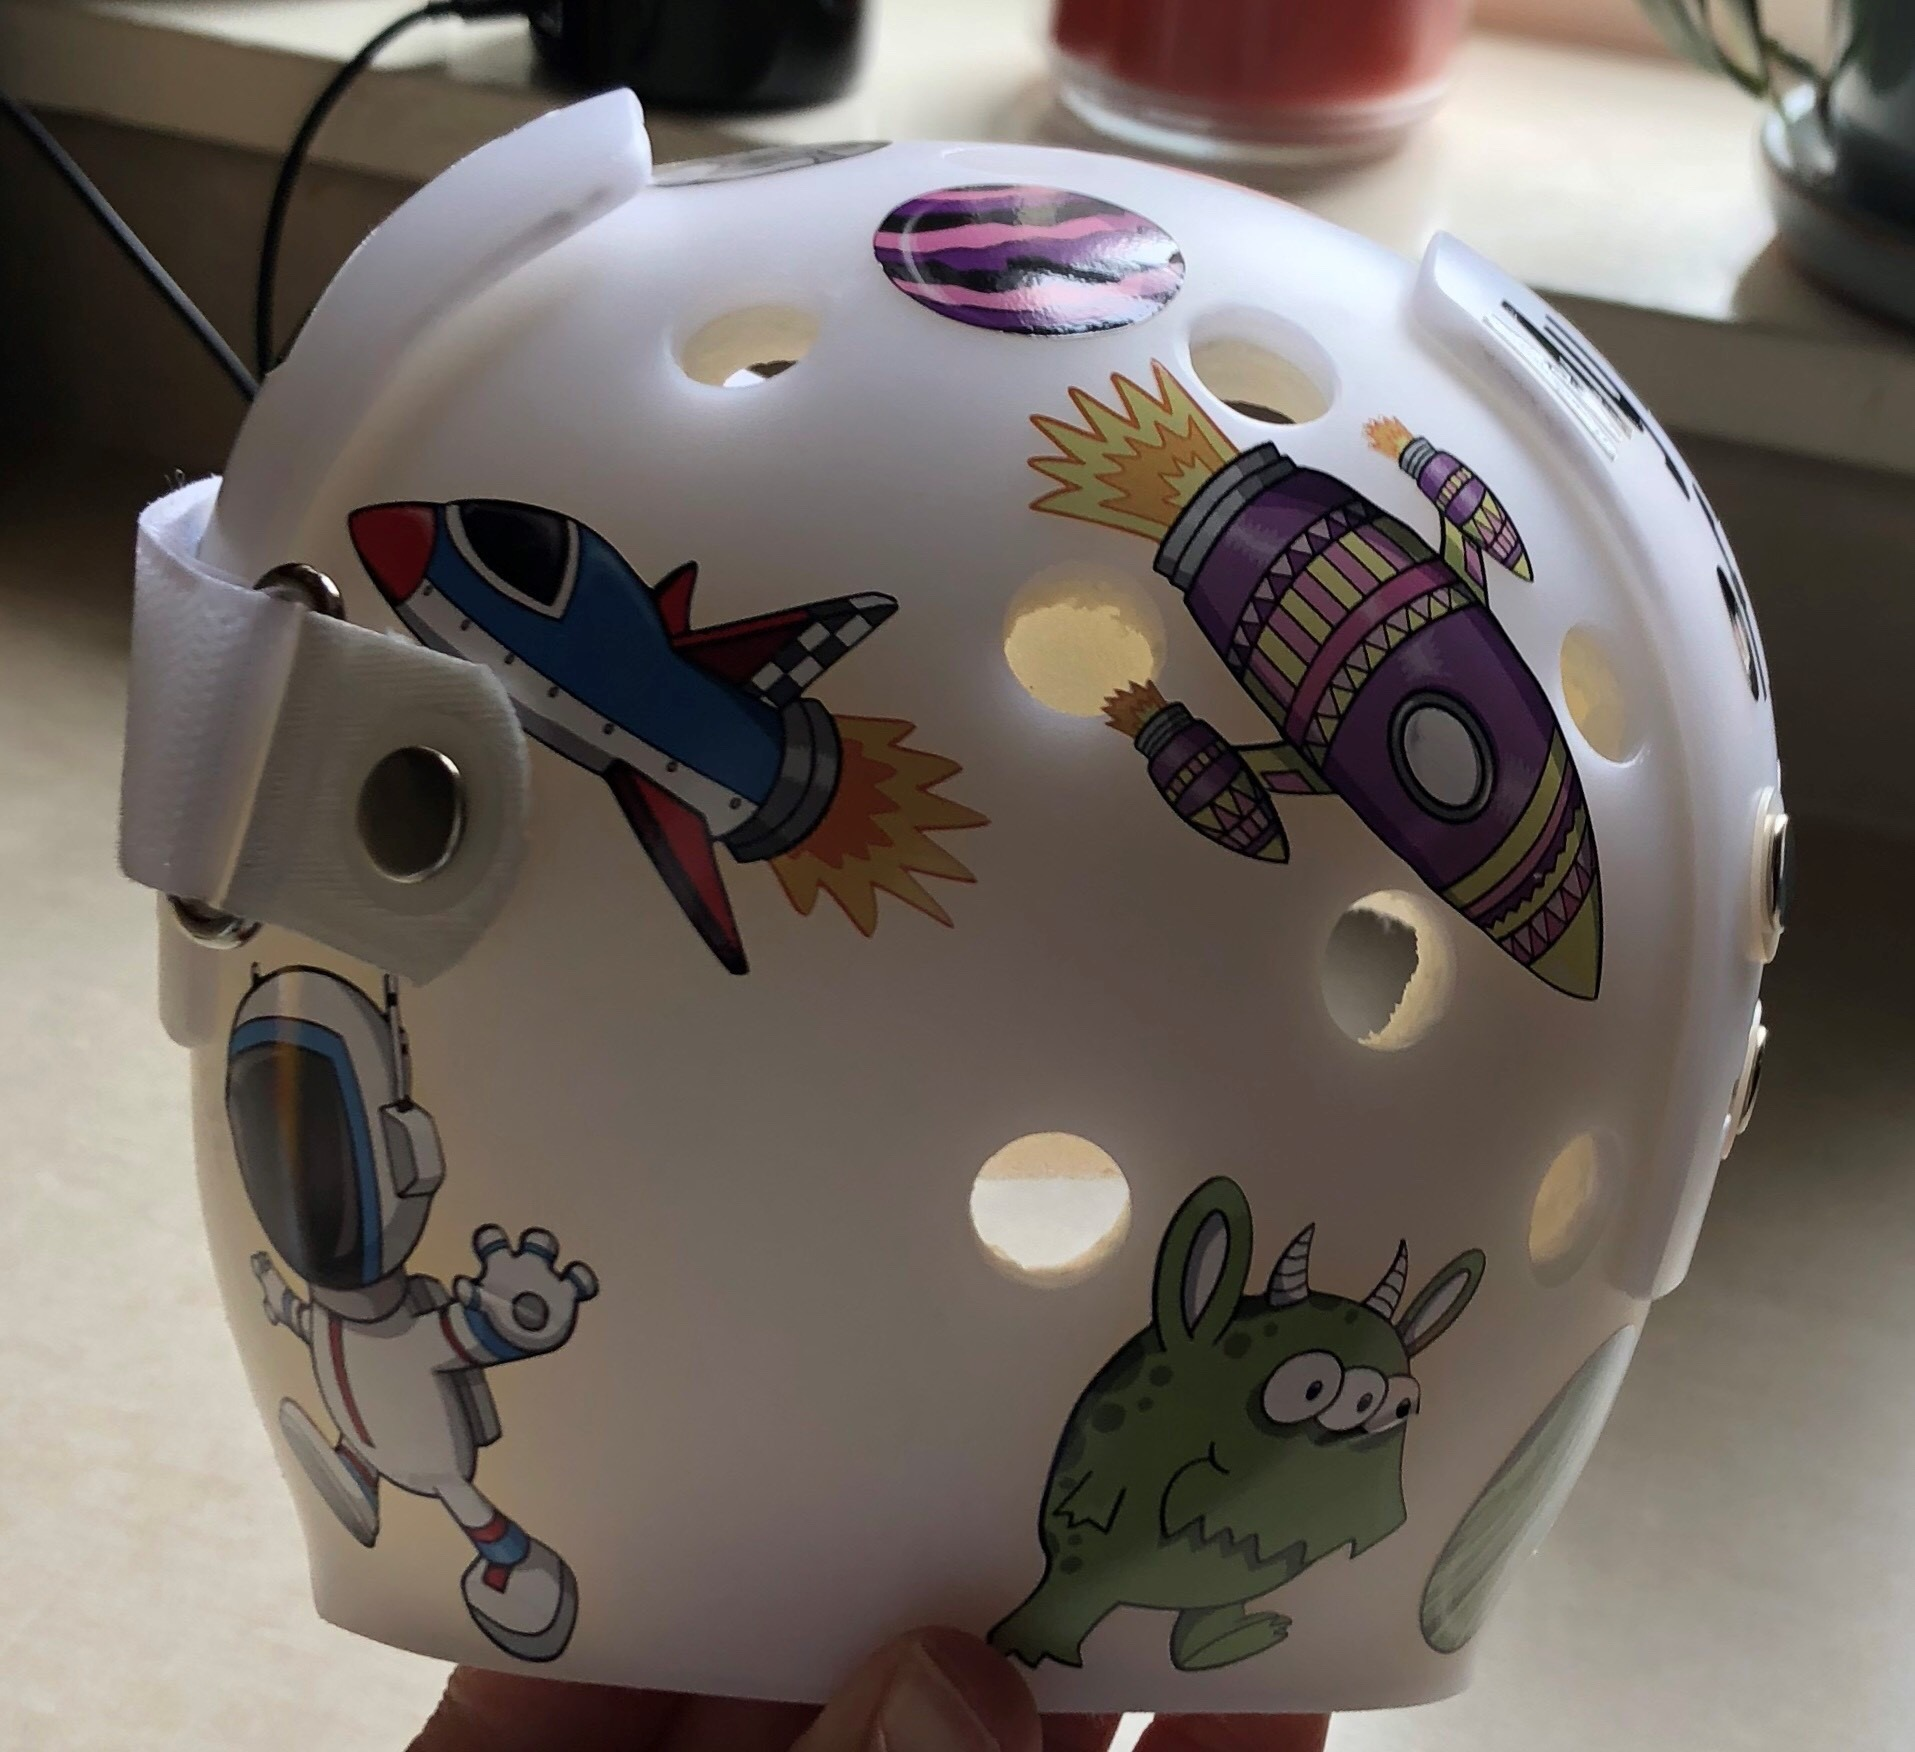 Spaceships cranial band